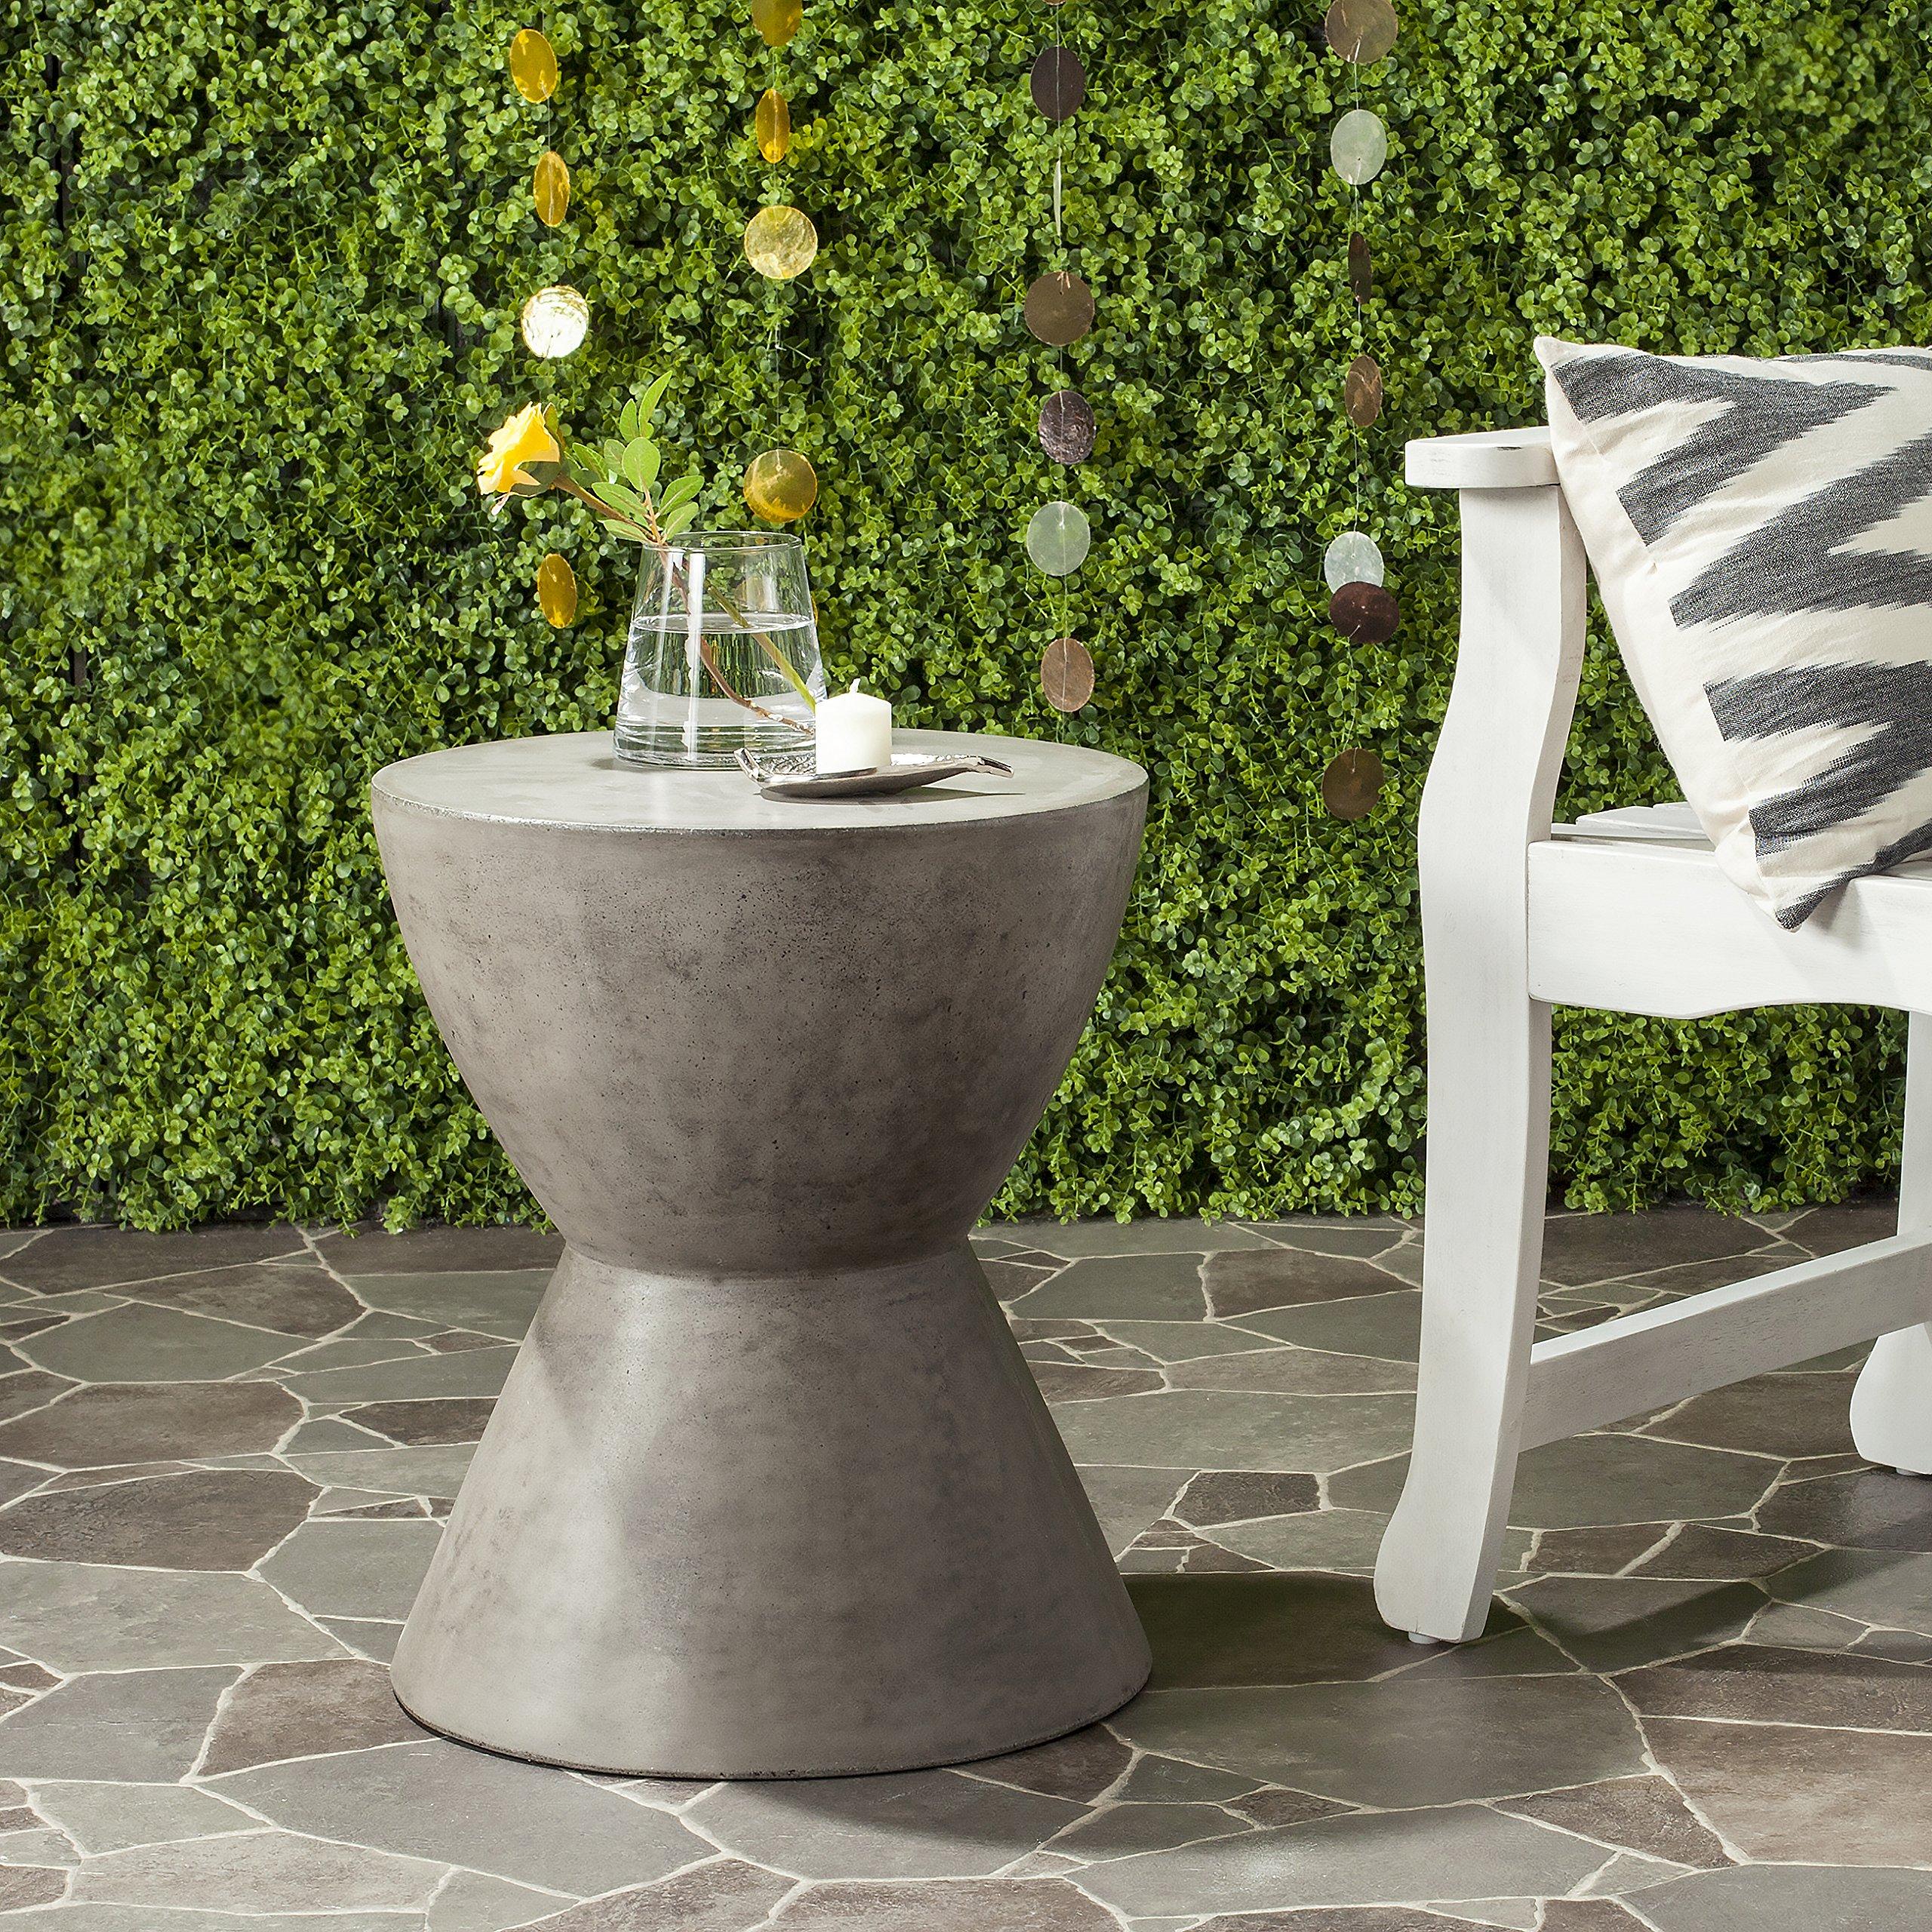 Safavieh Outdoor Collection Athena Modern Concrete Dark Grey Round 17.7-inch Accent Table